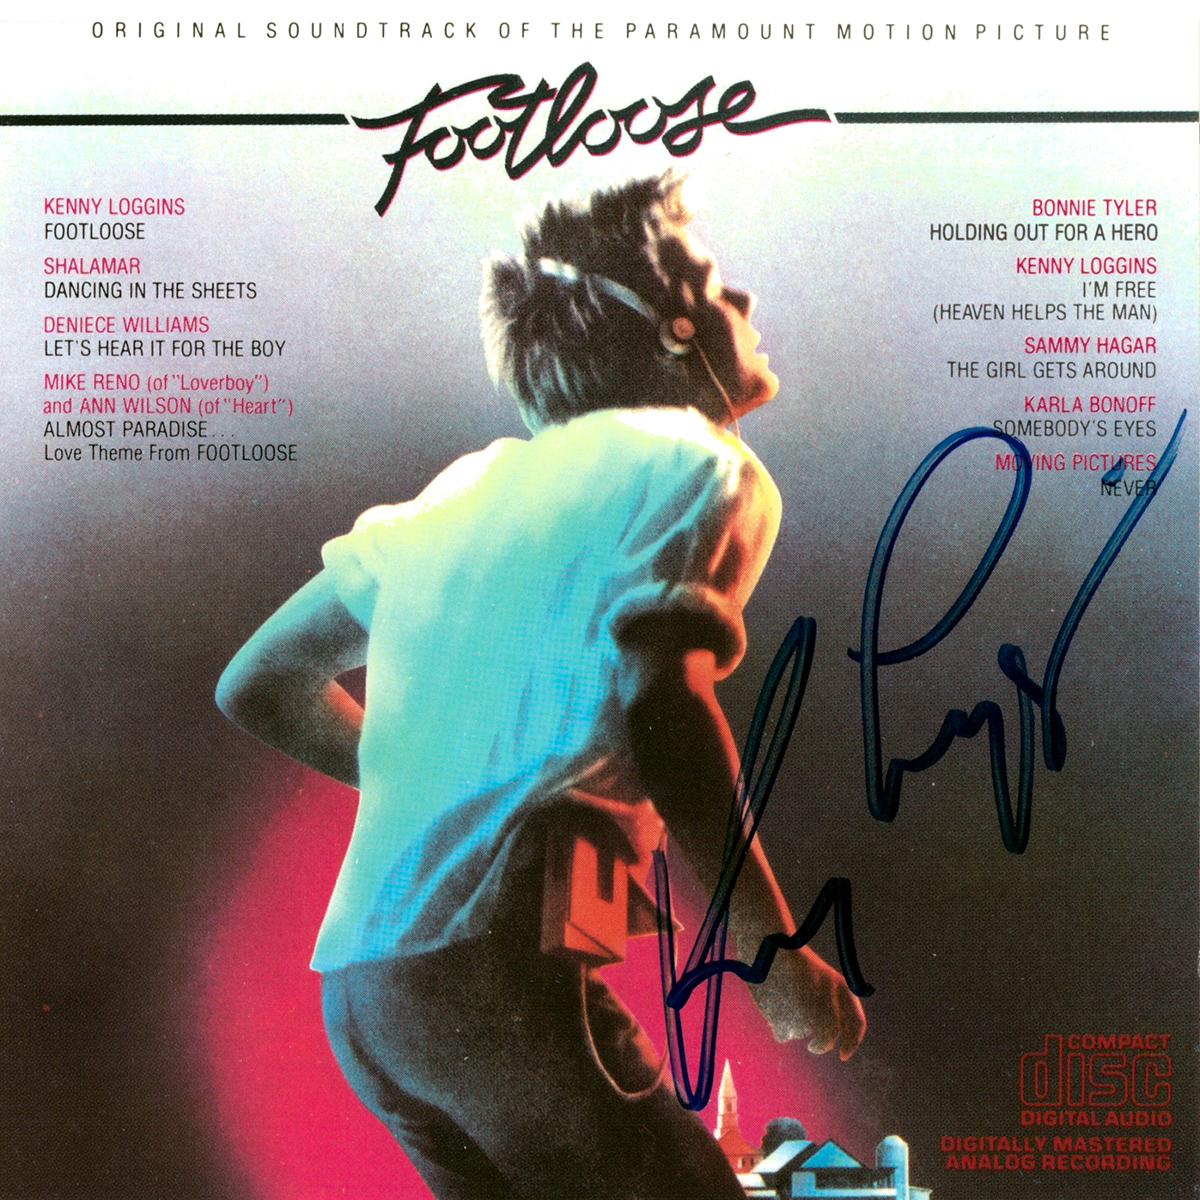 CD - Kenny Loggins - Footloose